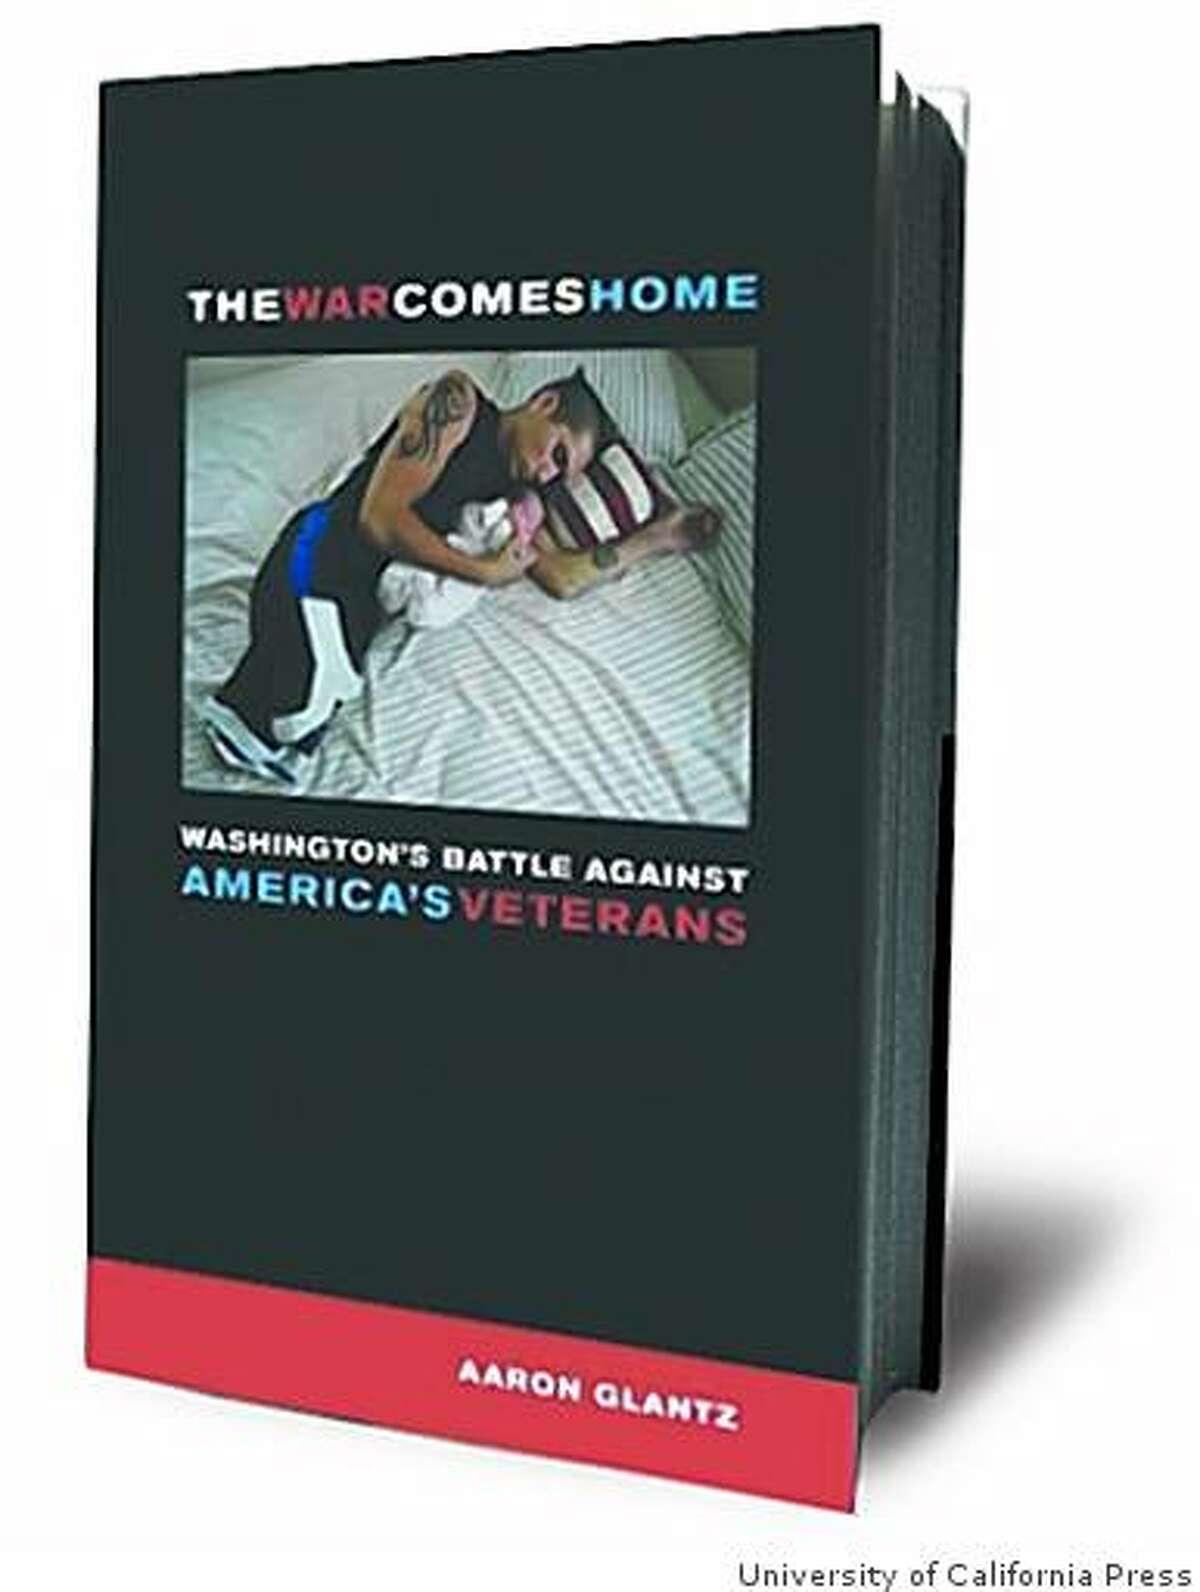 The War Comes Home: Washington's Battle against America's Veterans by Aaron Glantz